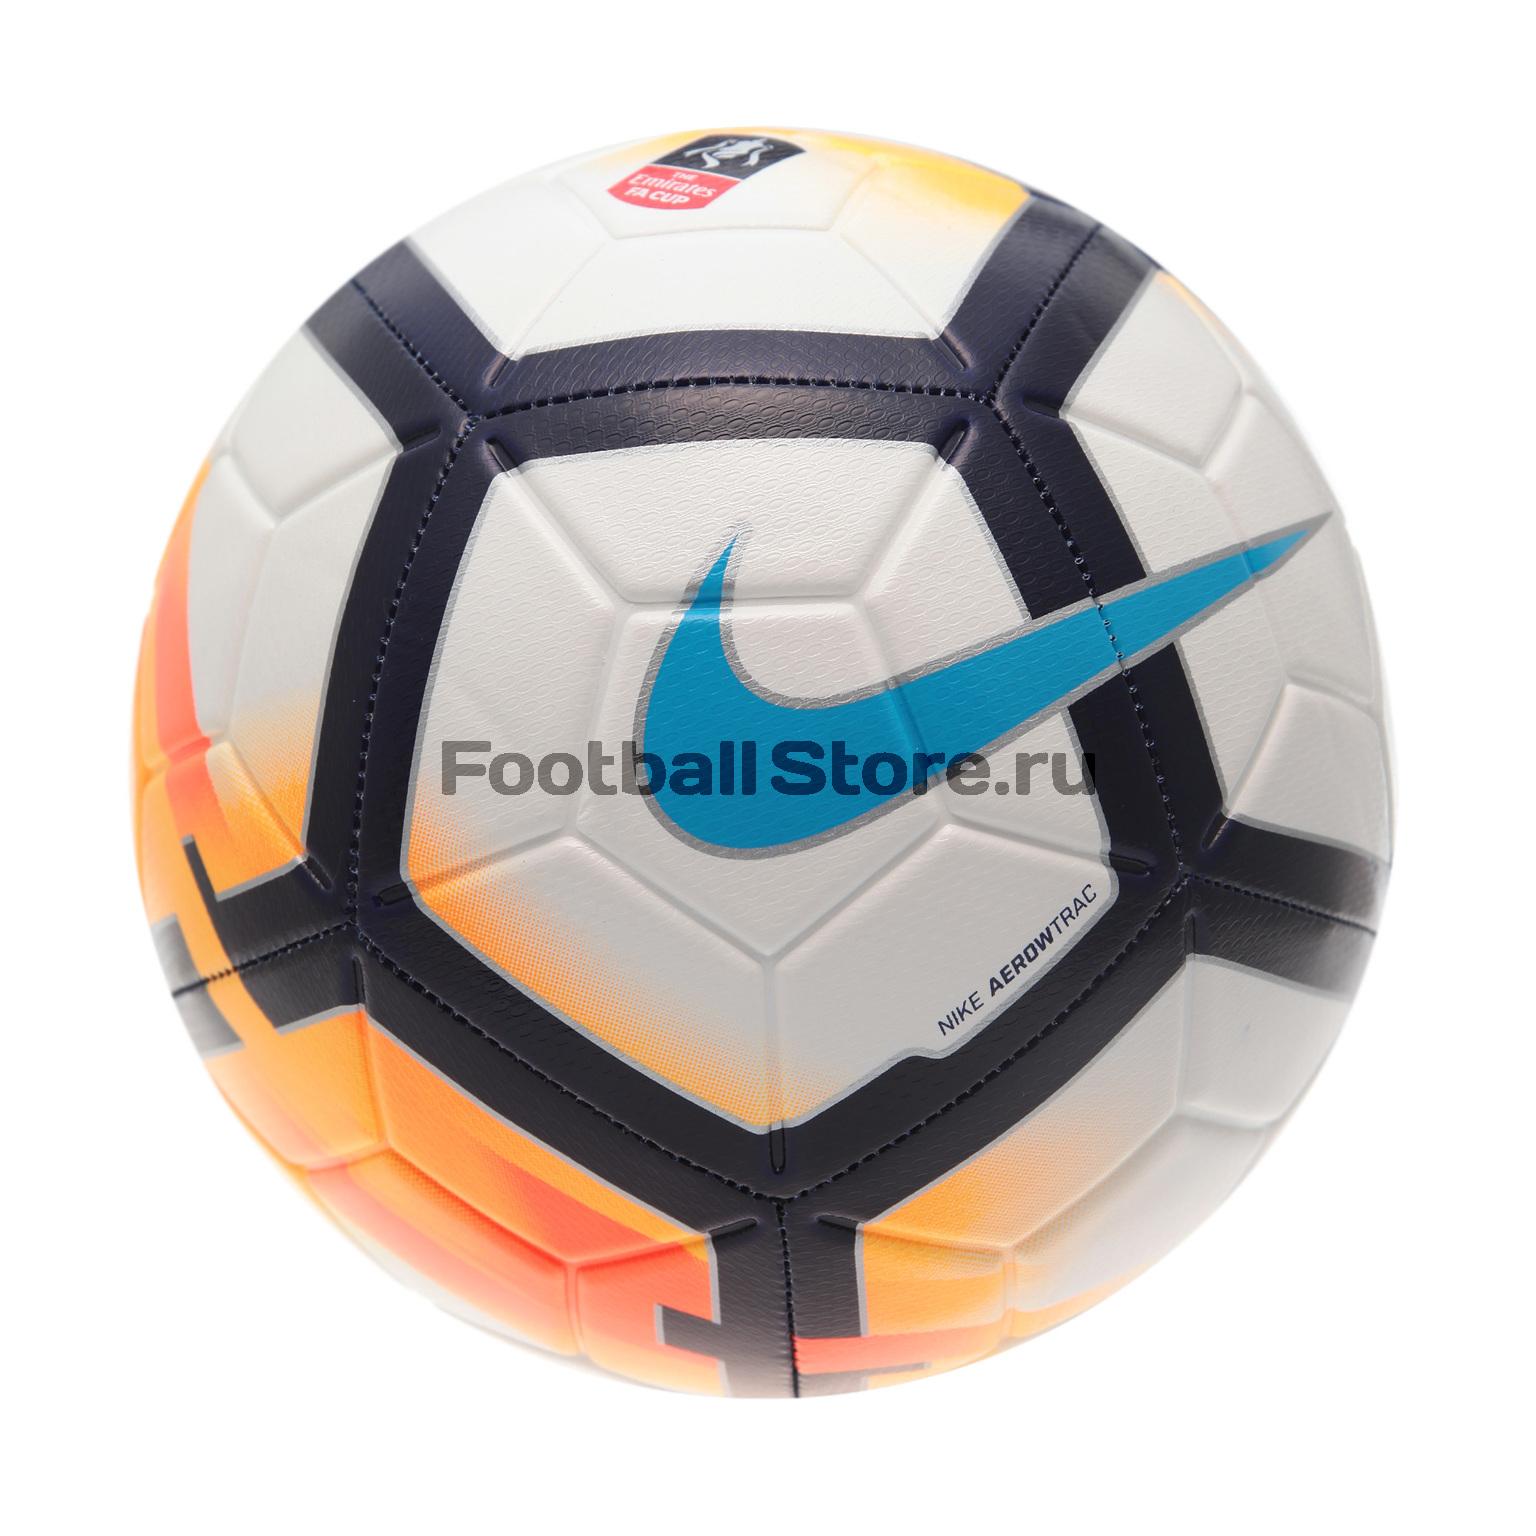 Классические Nike Мяч Nike FA Cup NK Strike SC3206-100 классические nike мяч nike nk prmr team fifa sc2971 100